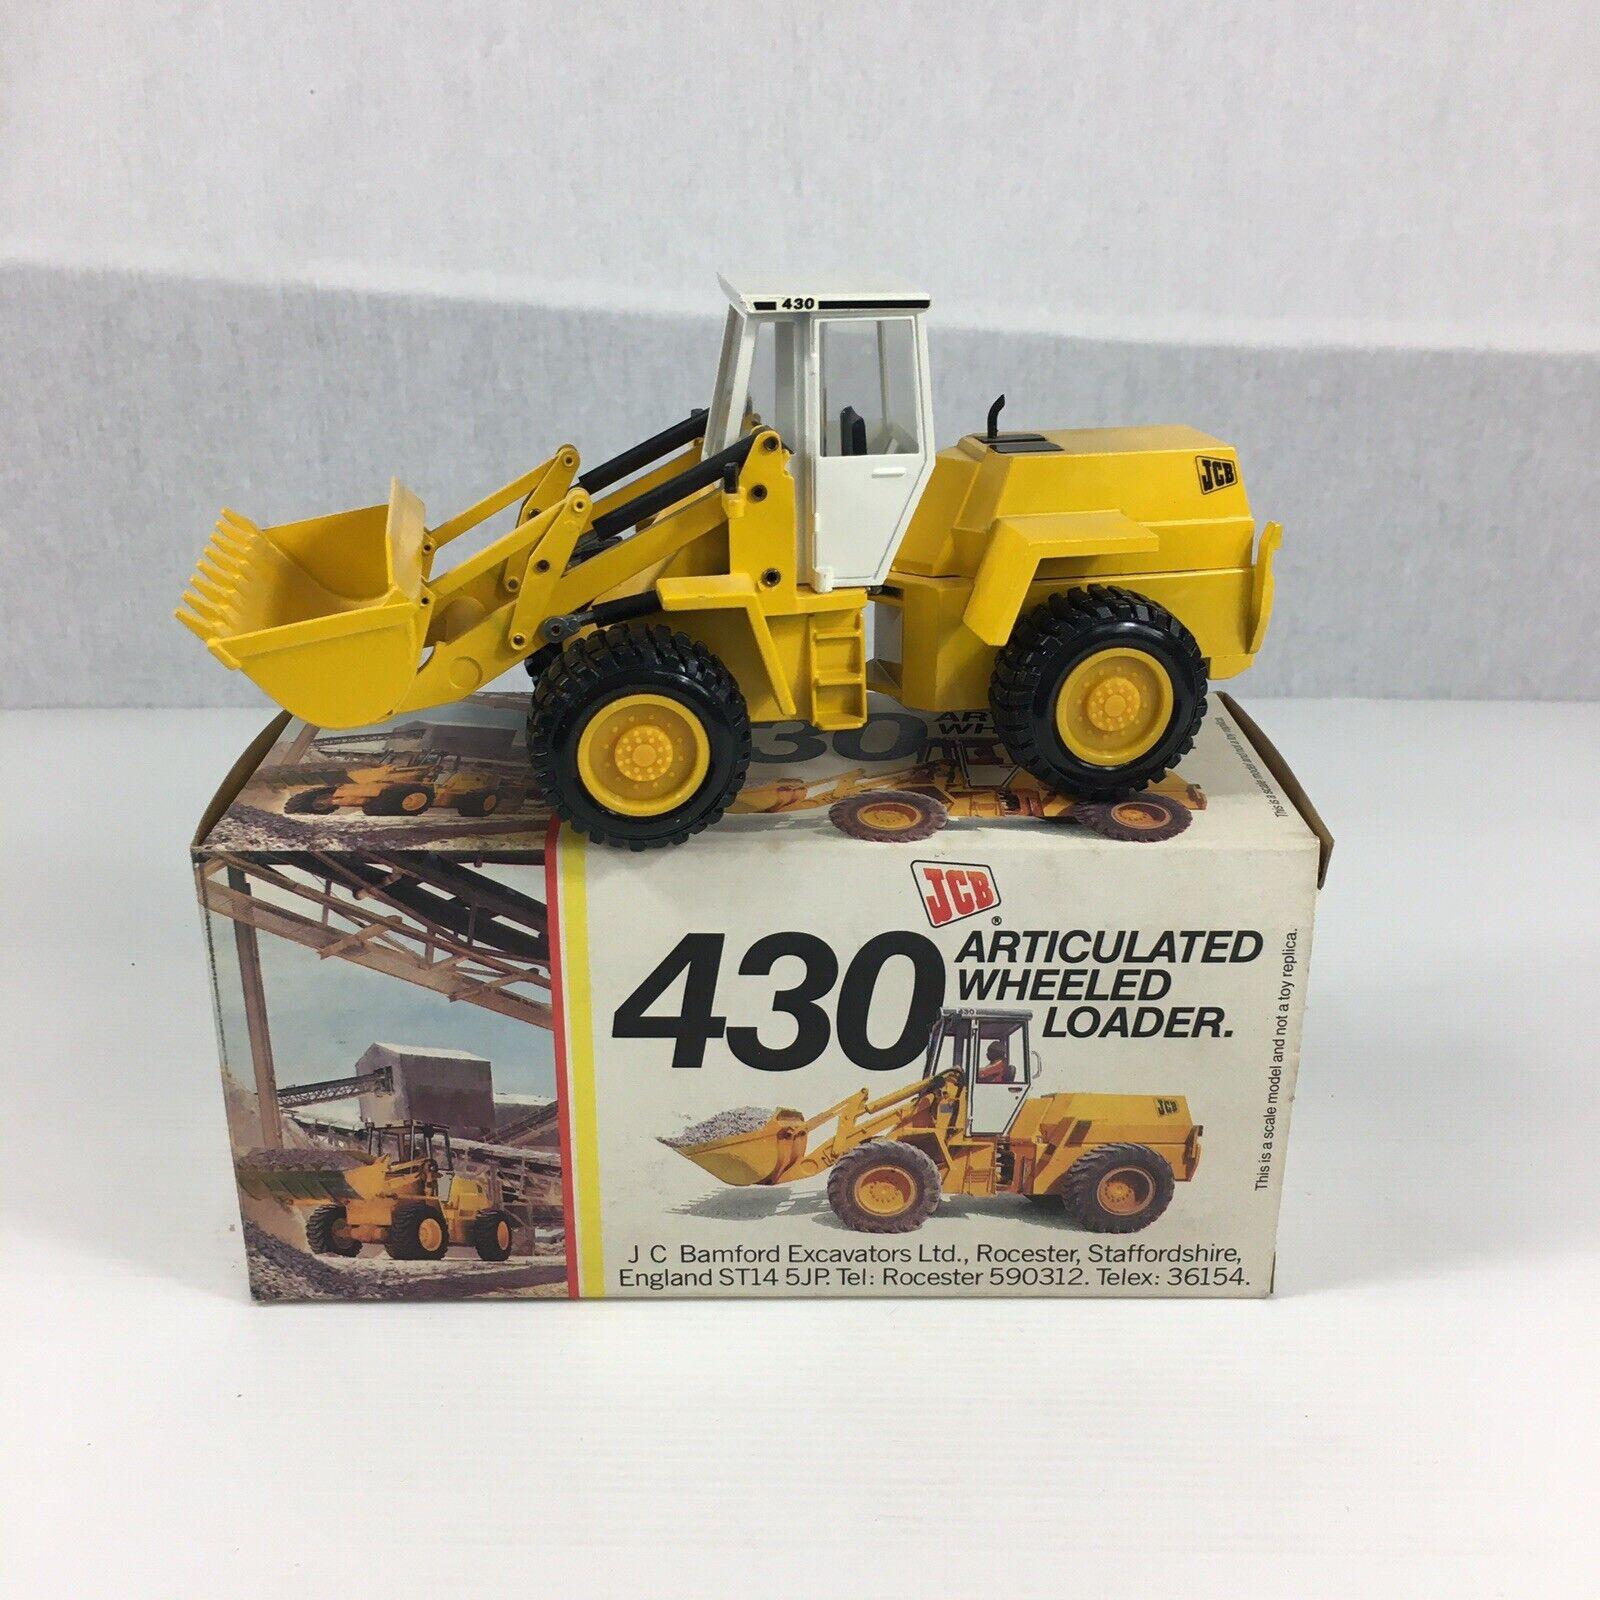 JCB 430 Articulated Wheeled Loader 251 N Z G Boxed